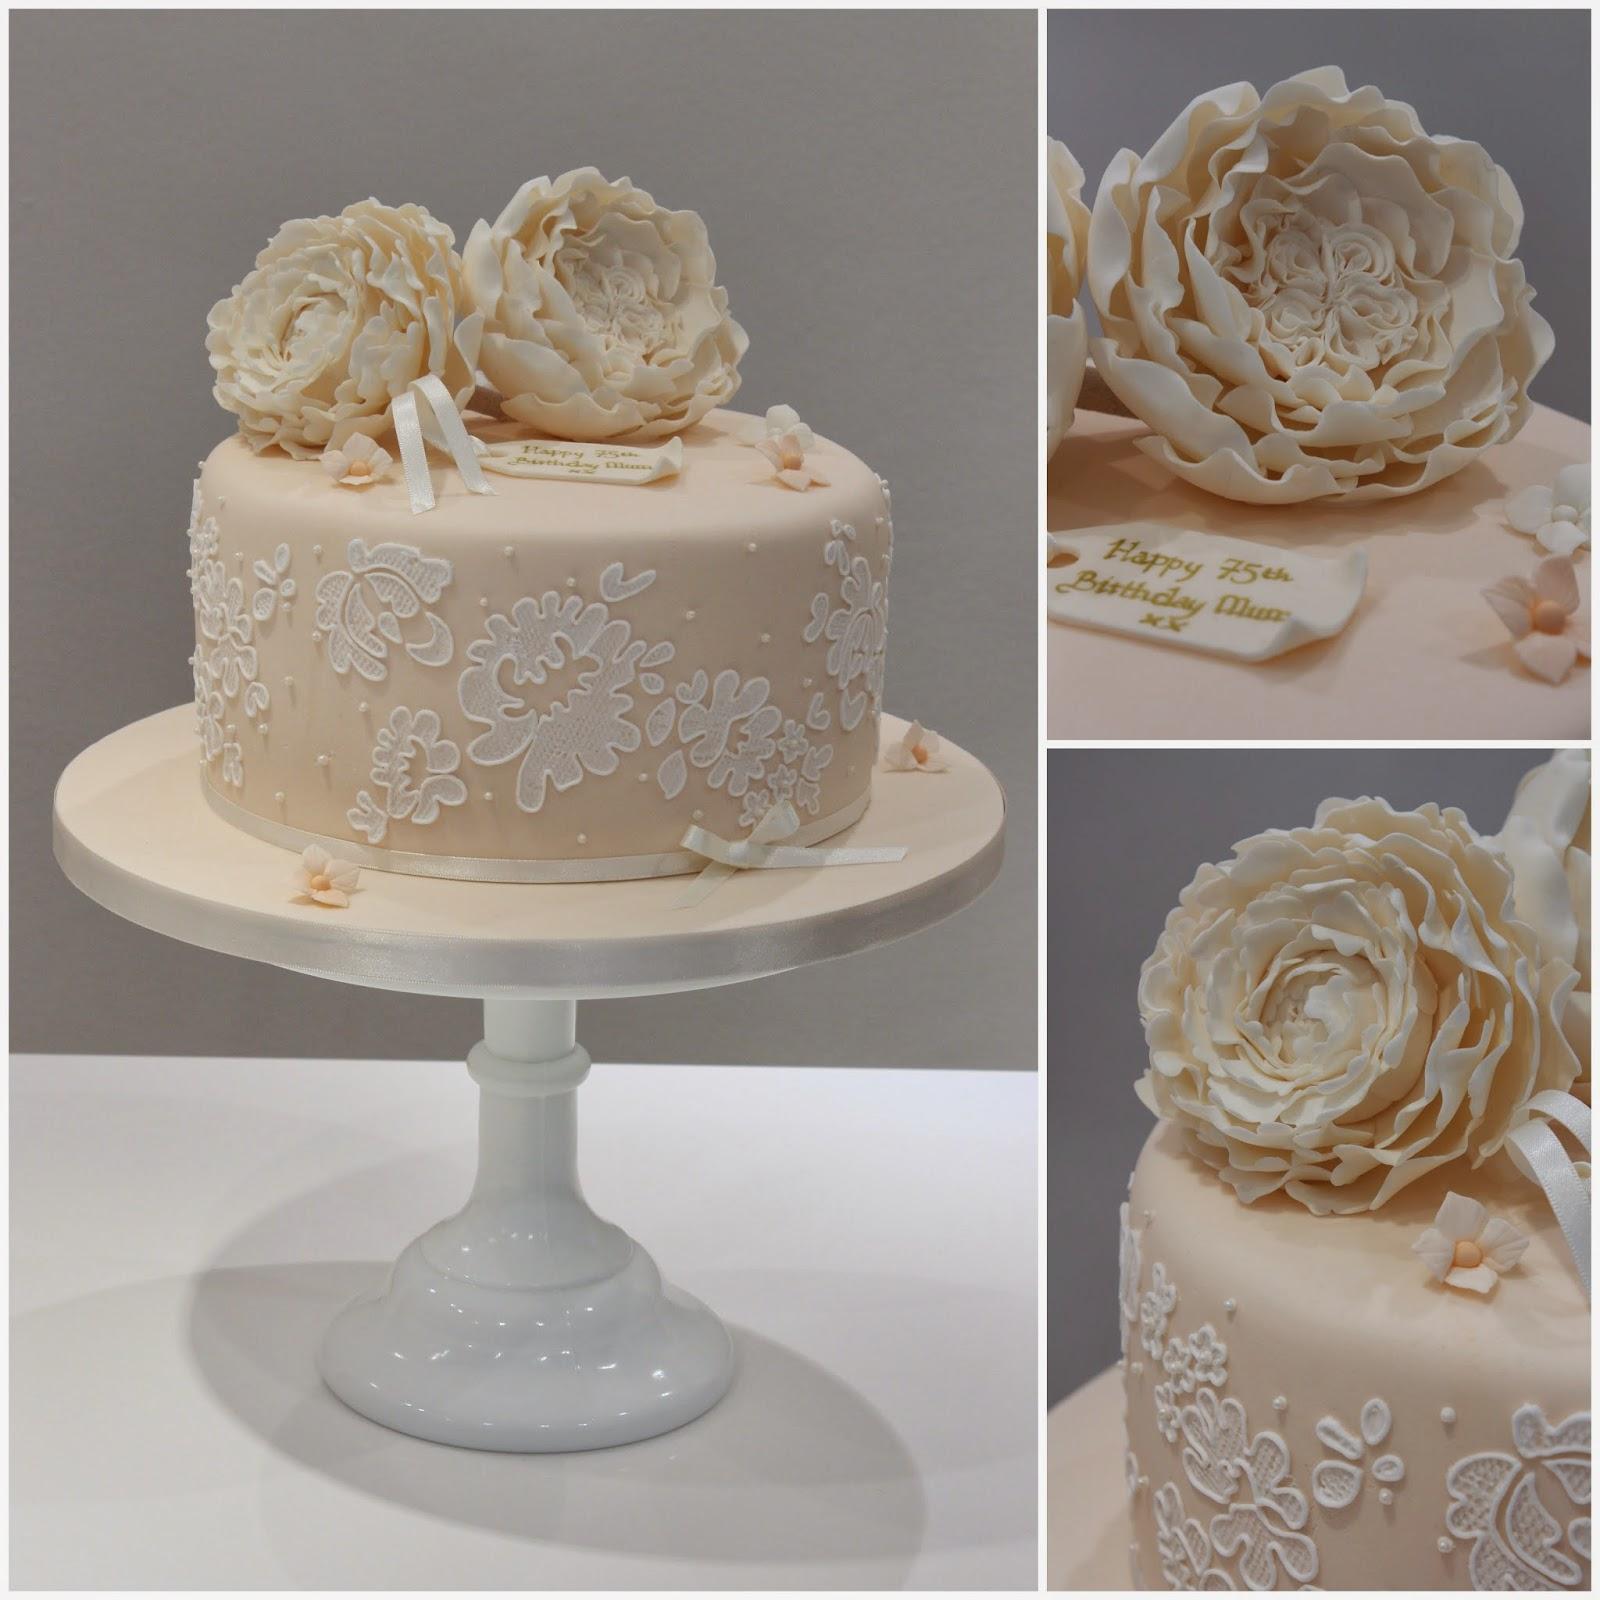 Vintage Birthday Cake Images : Tiers & Tiaras: David Austin Vintage Birthday Cake